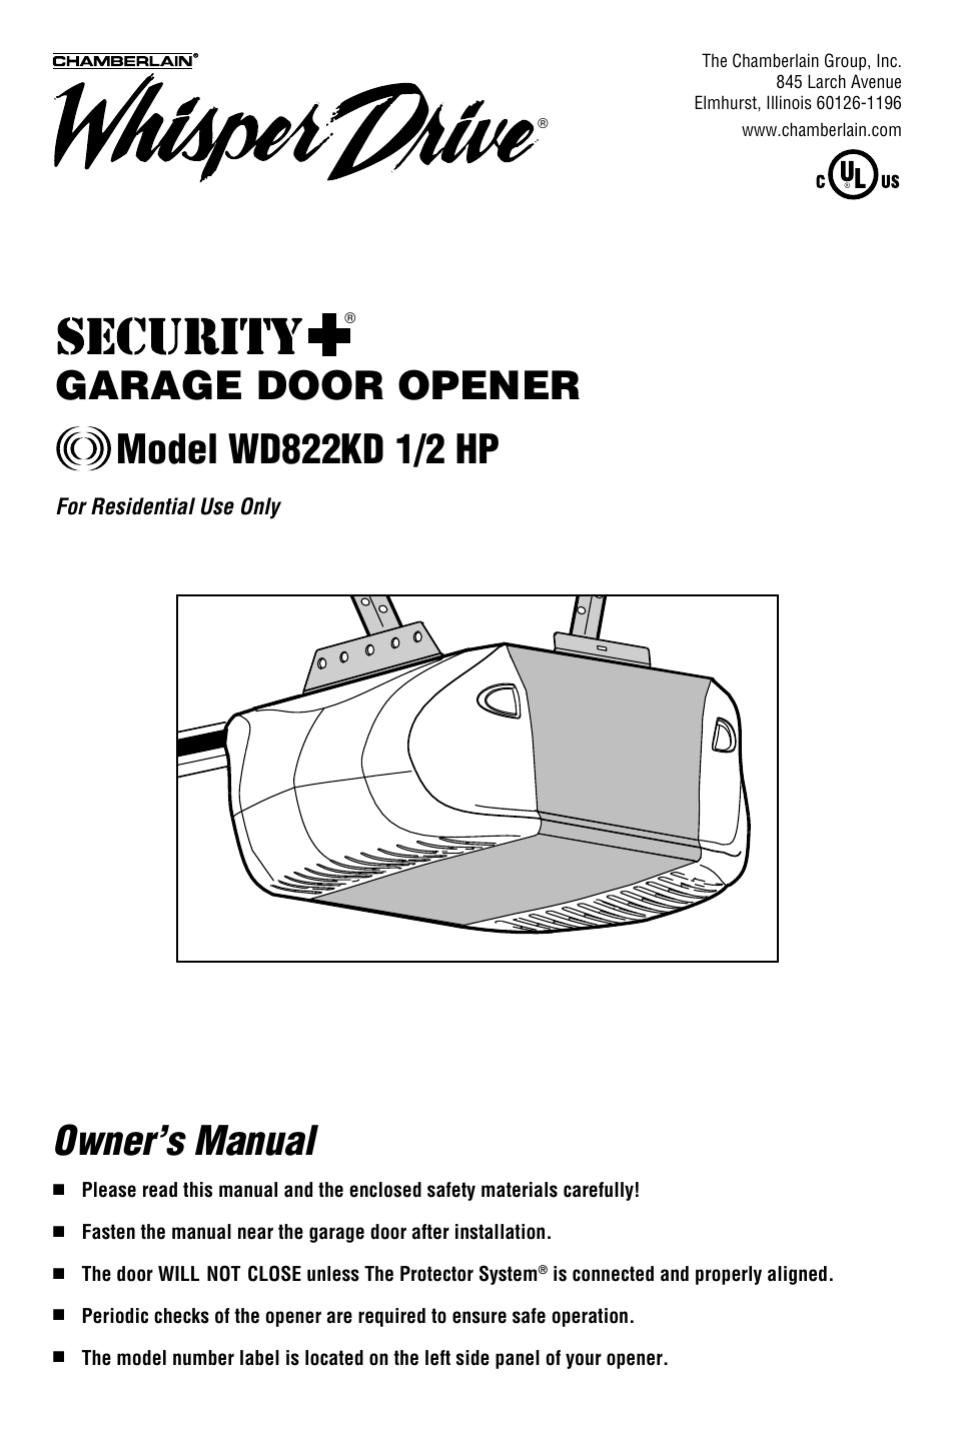 Chamberlain Whisper Drive Garage Door Opener Manual